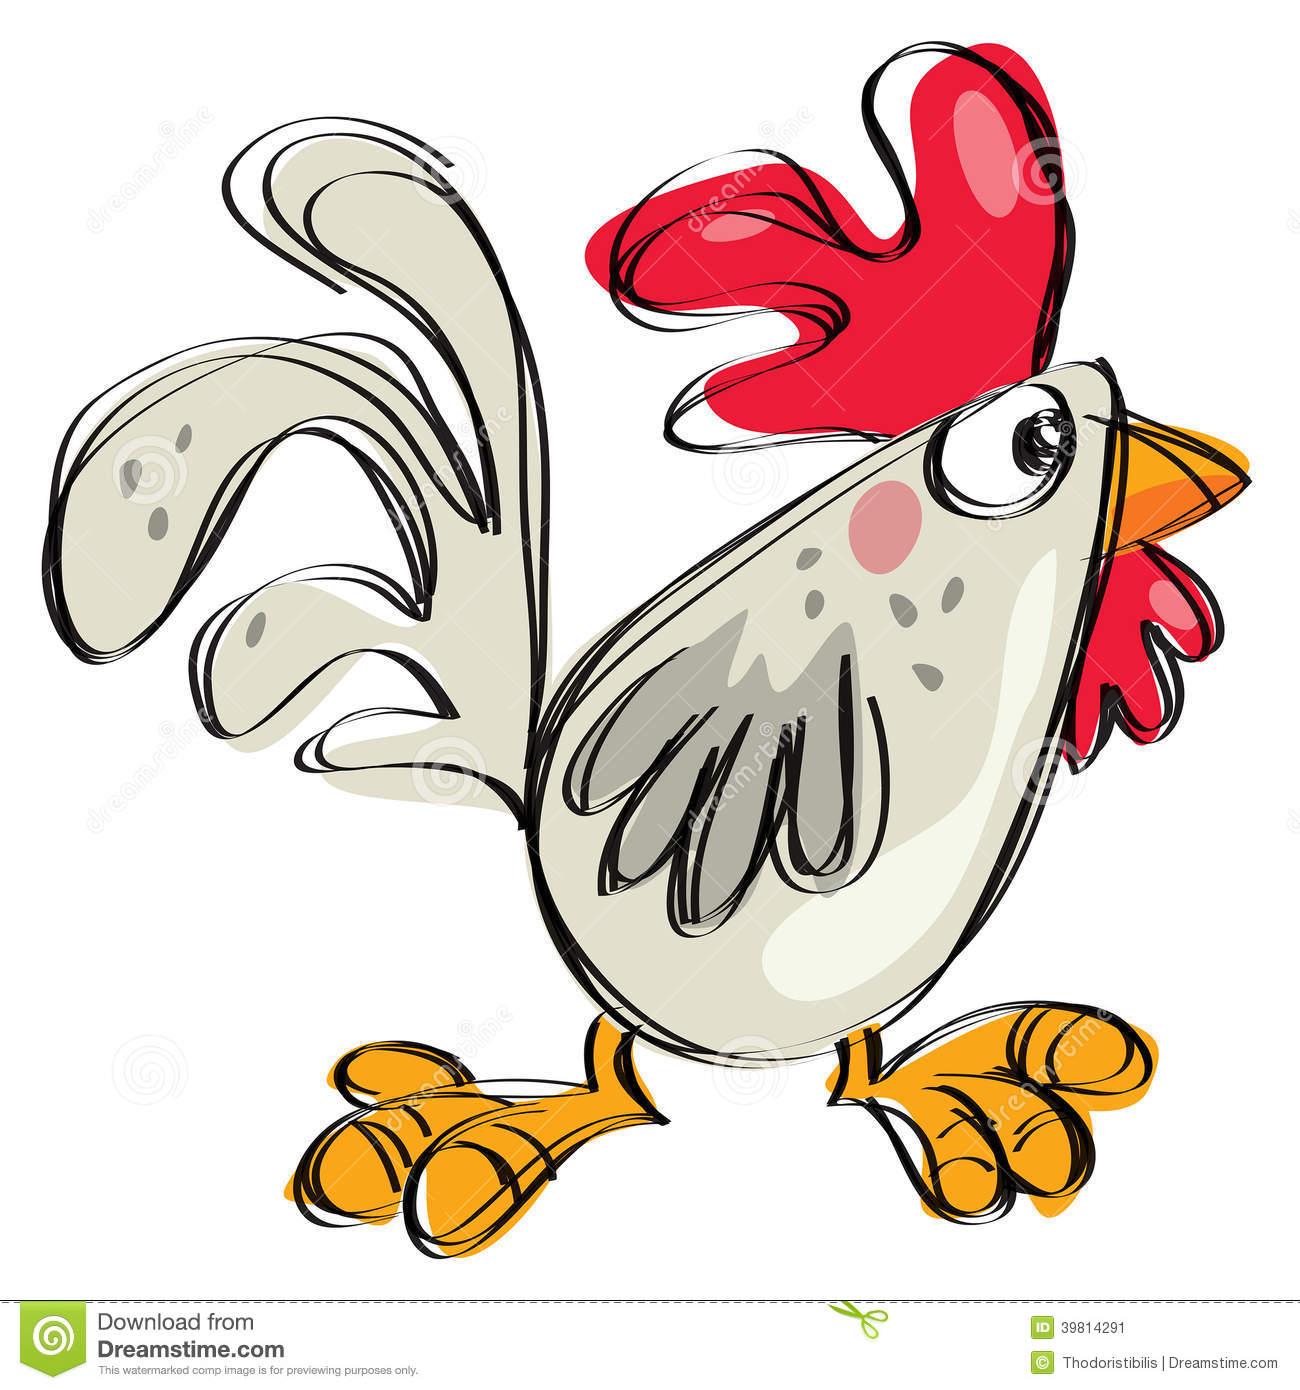 1300x1390 Baby Chicken Drawings Cartoon Baby Chicken White Any Chicken